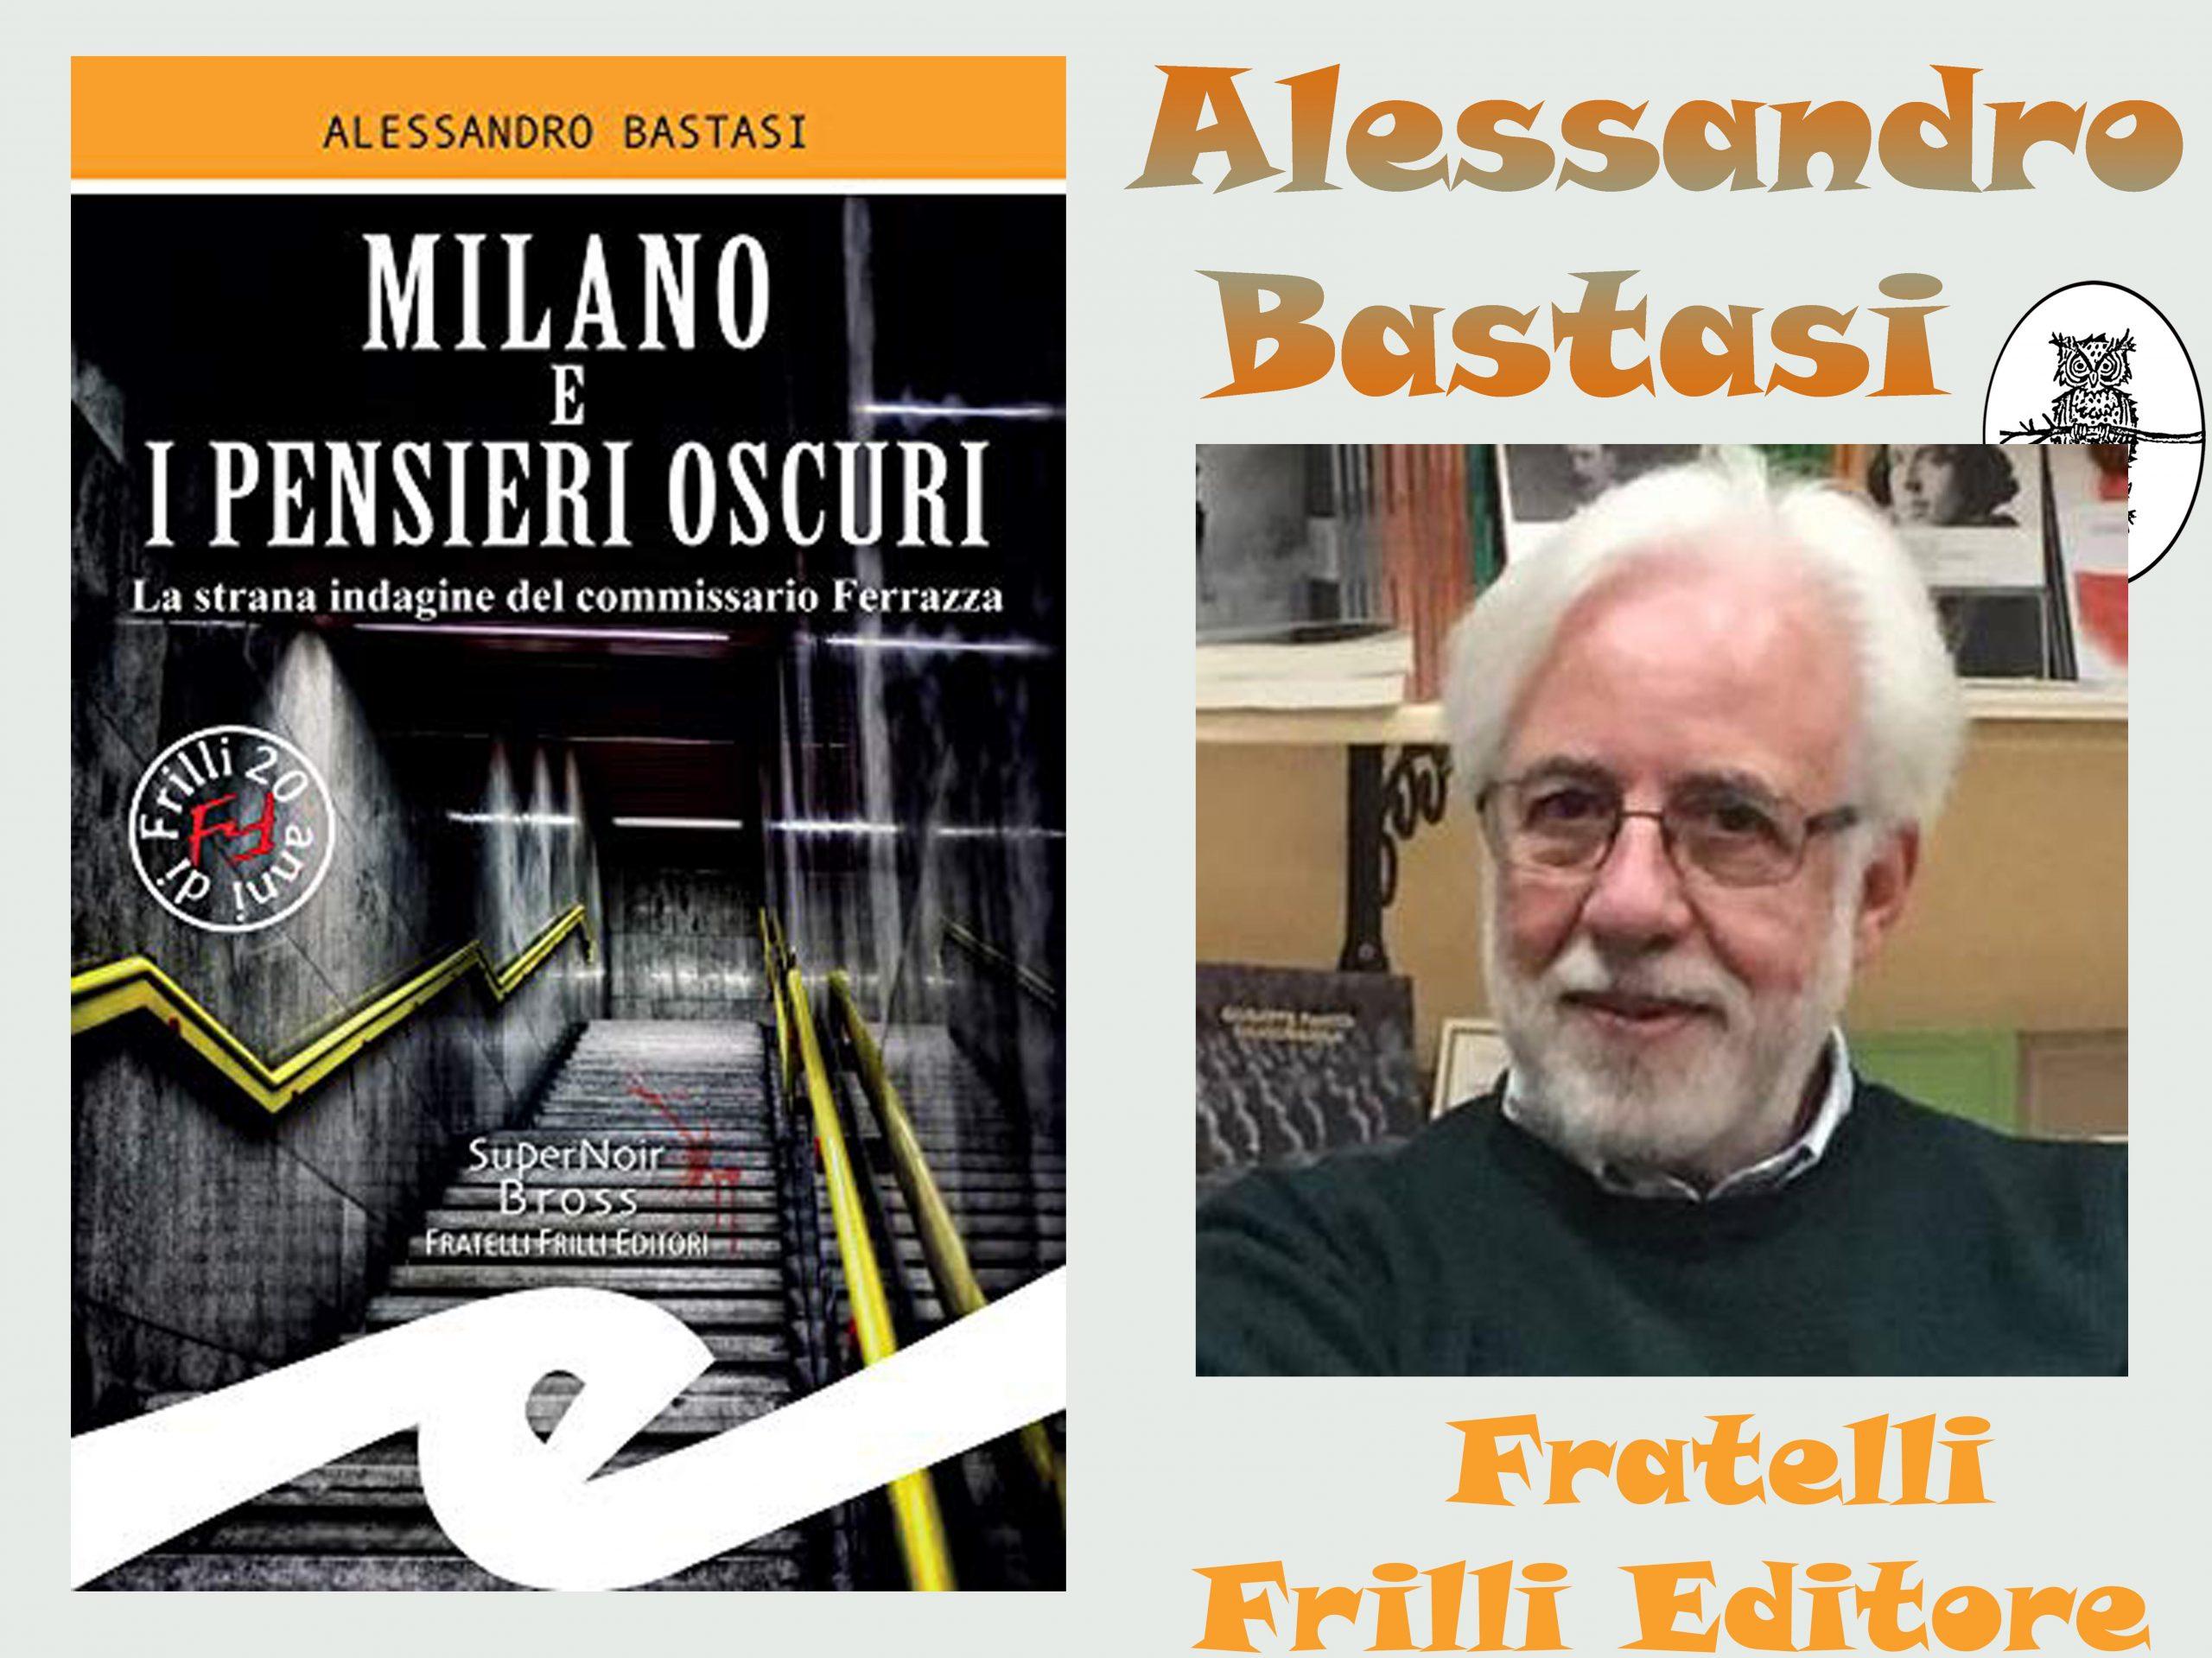 Alessandro Bastasi